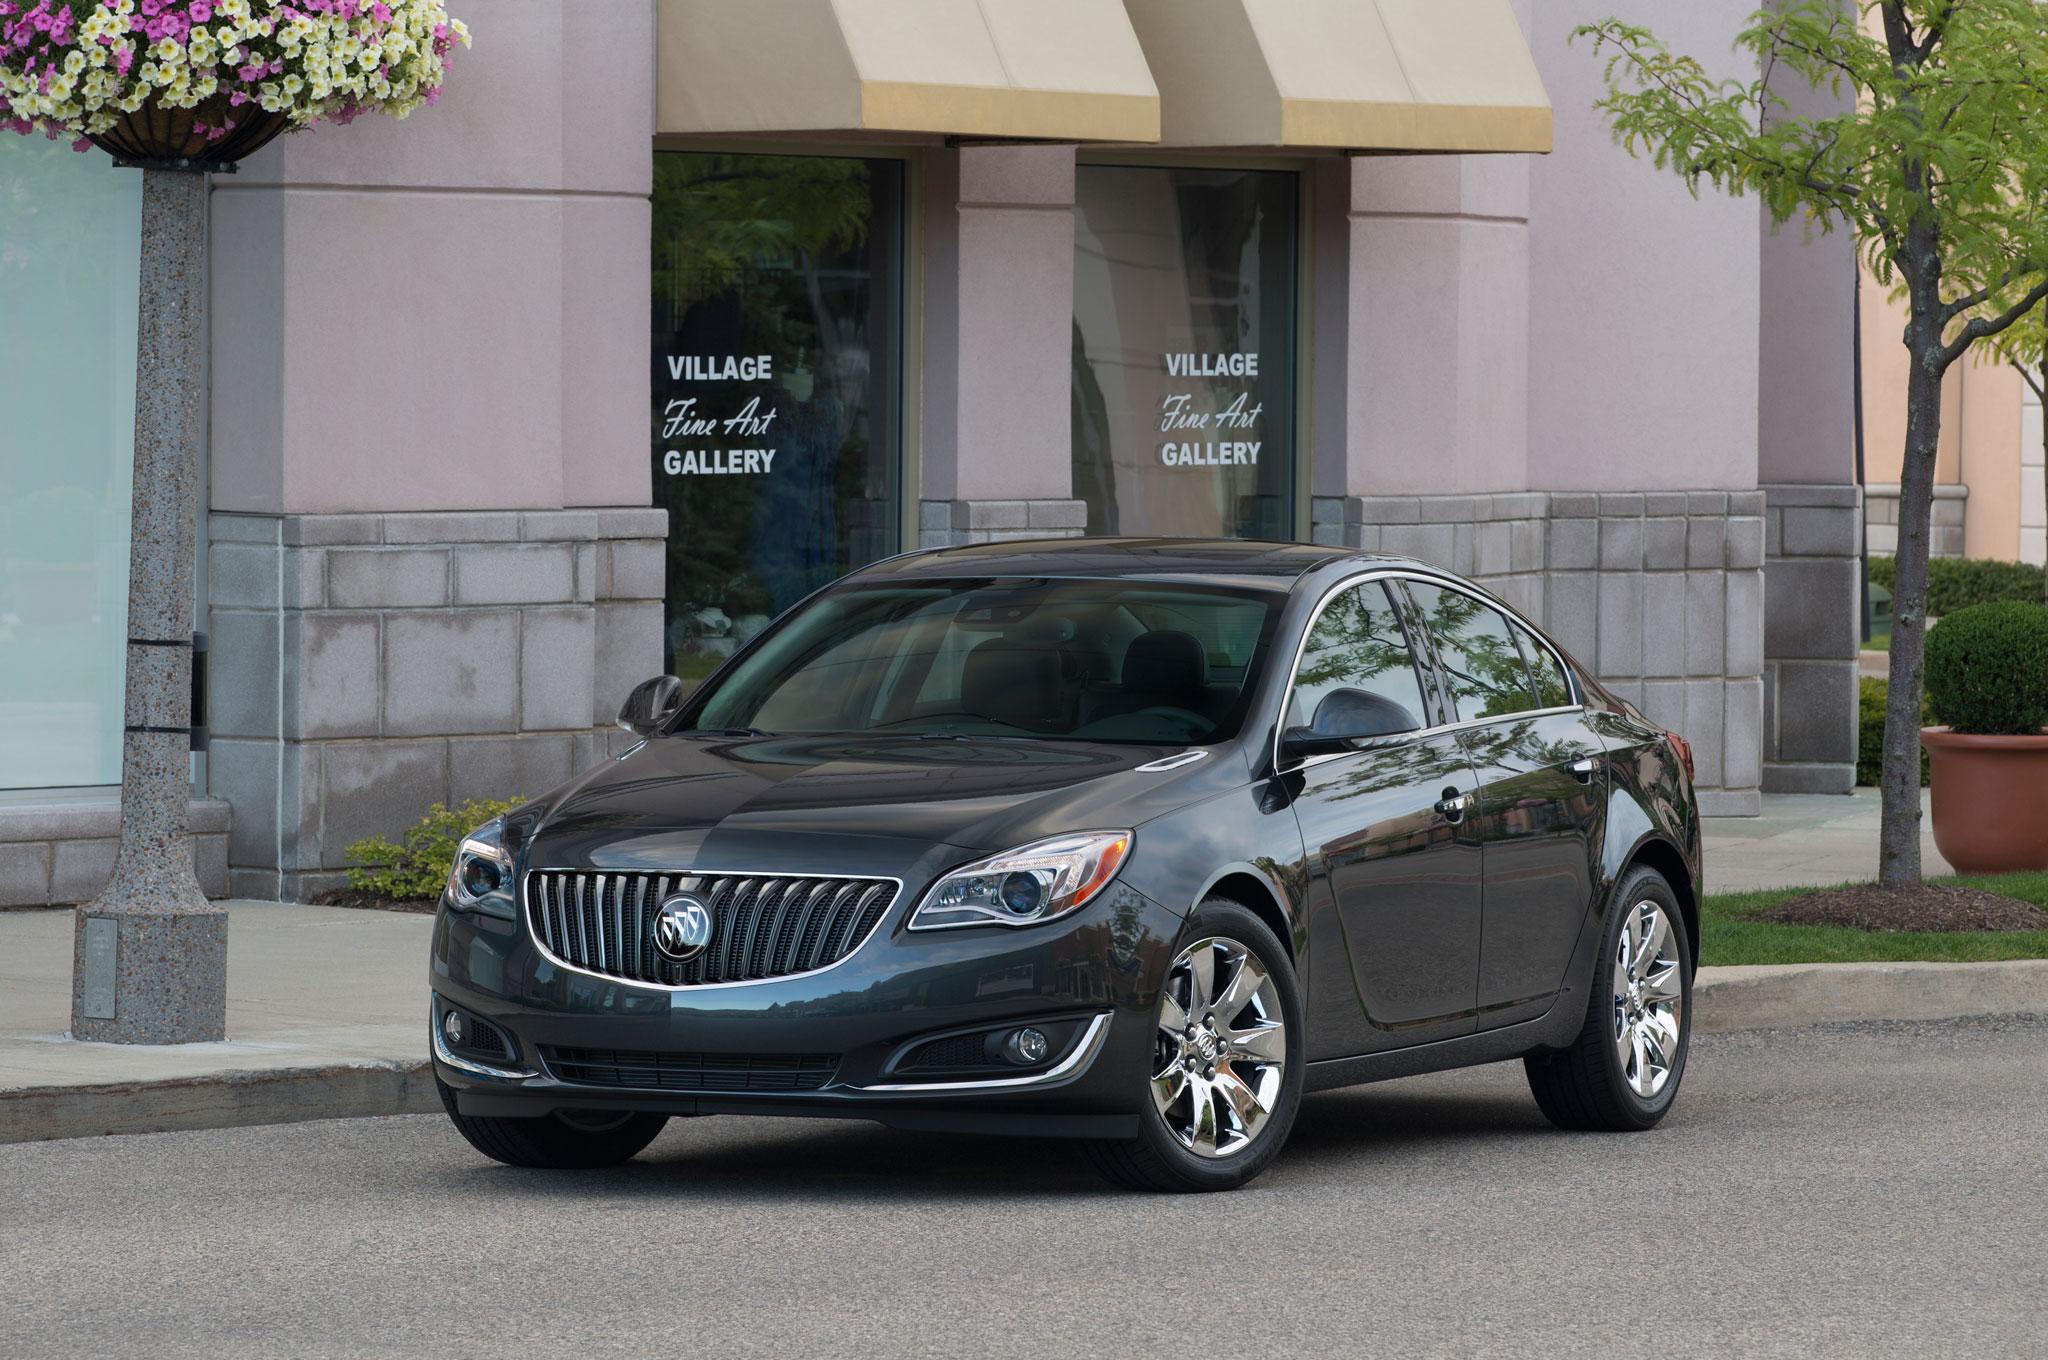 2014 Buick Regal Front Left View1